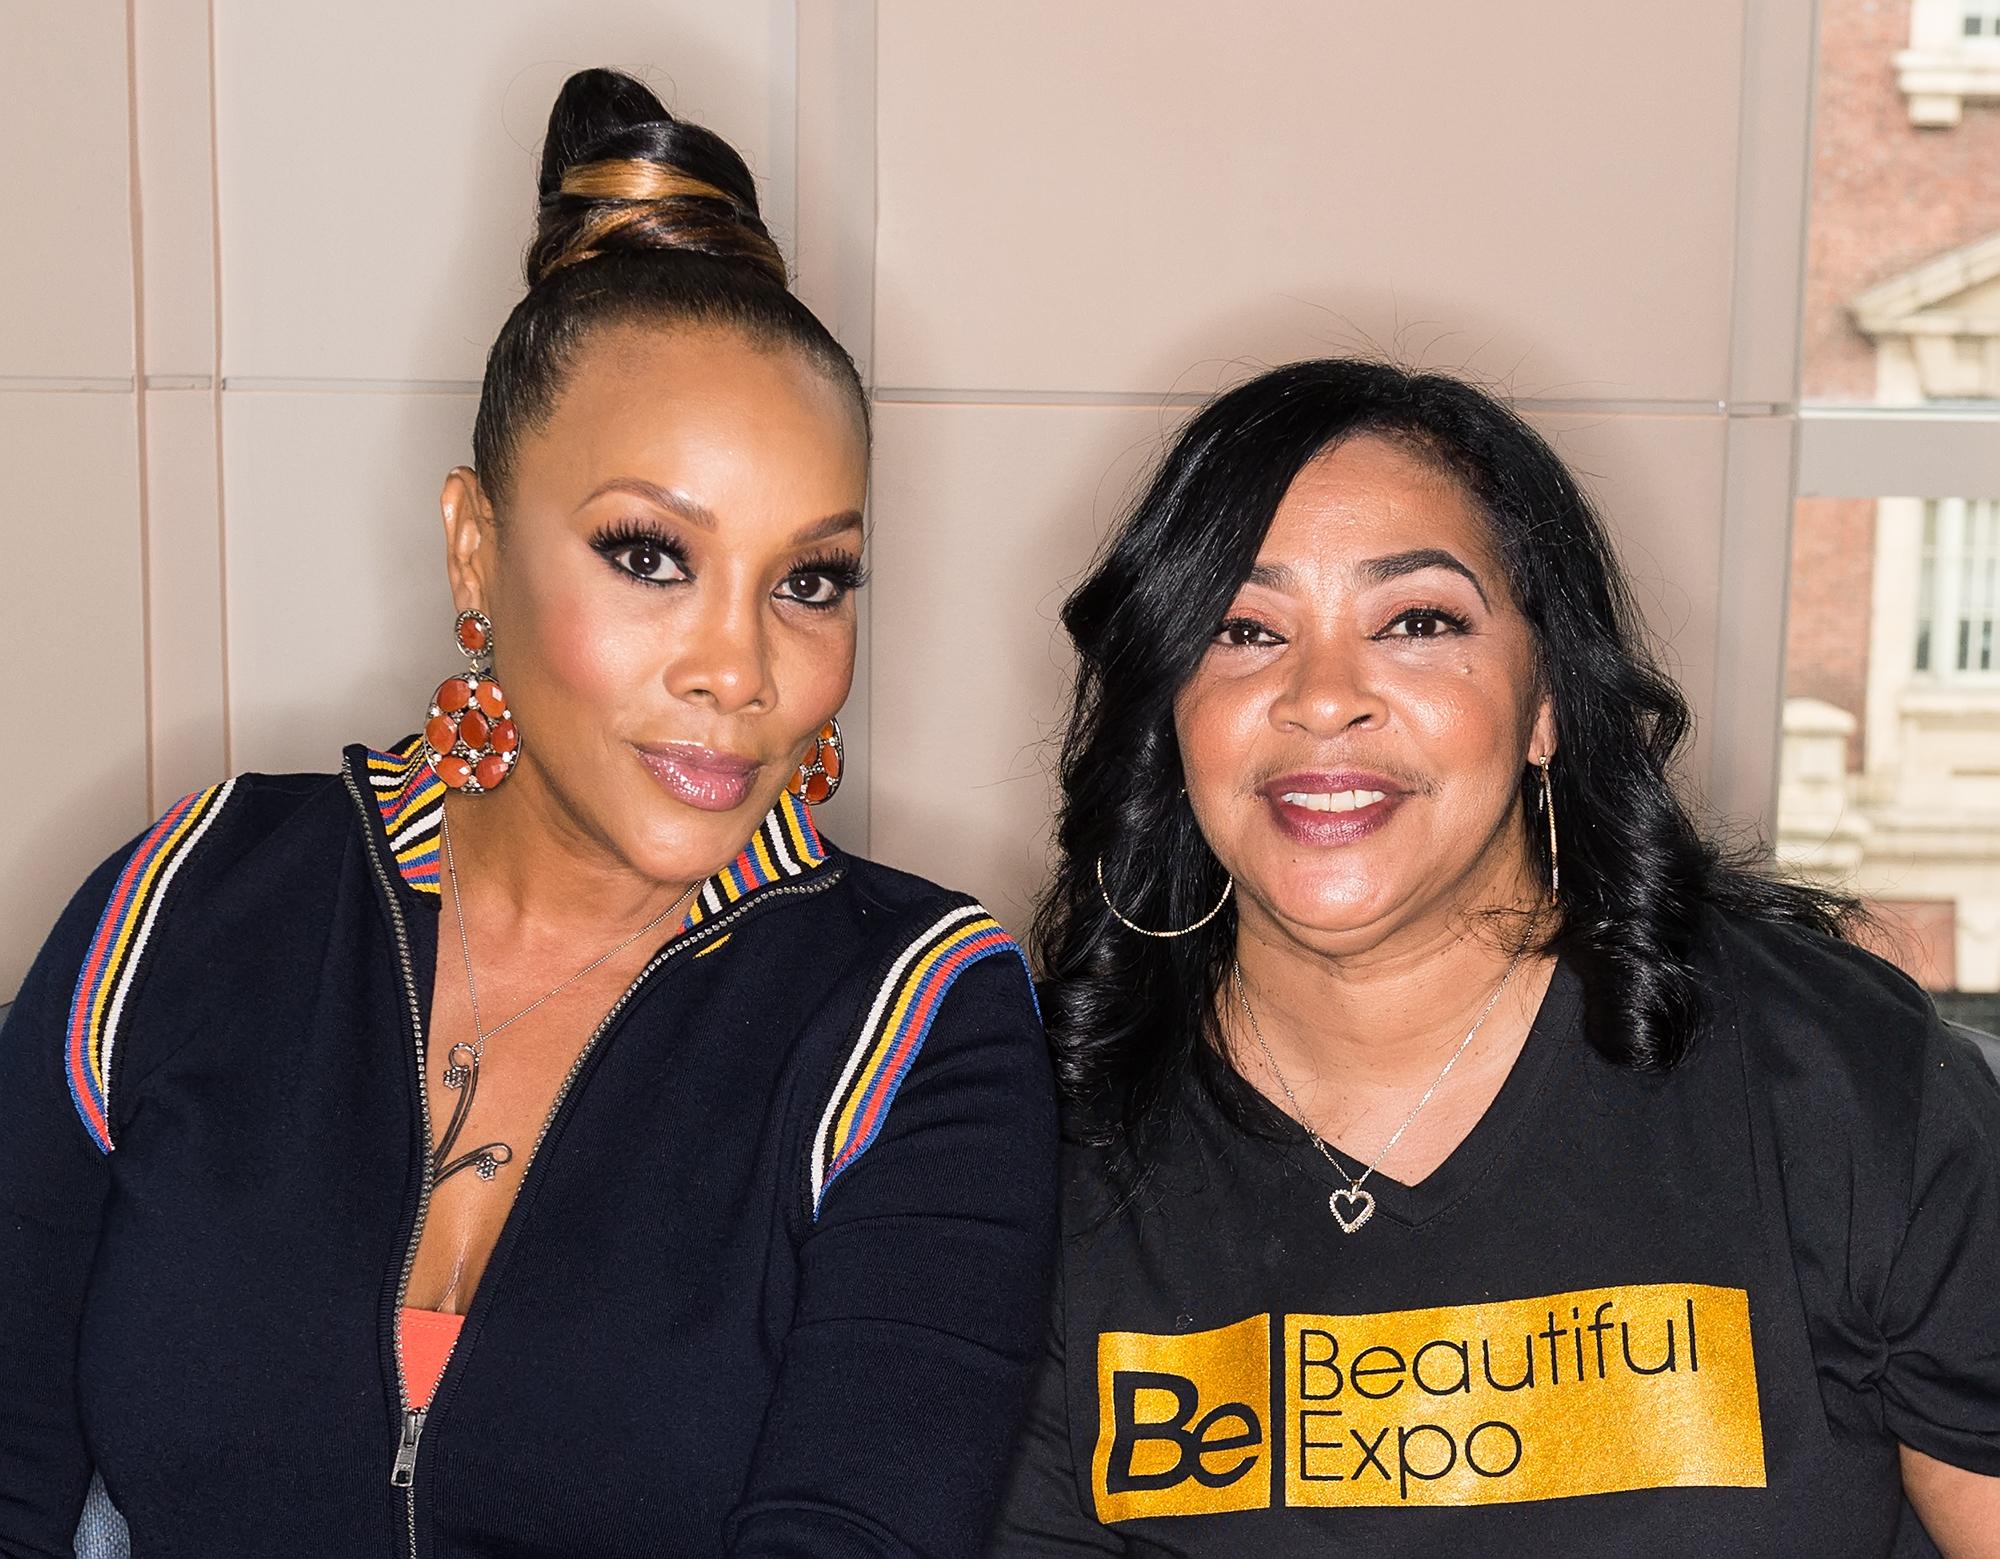 Be Beautiful Expo 2017